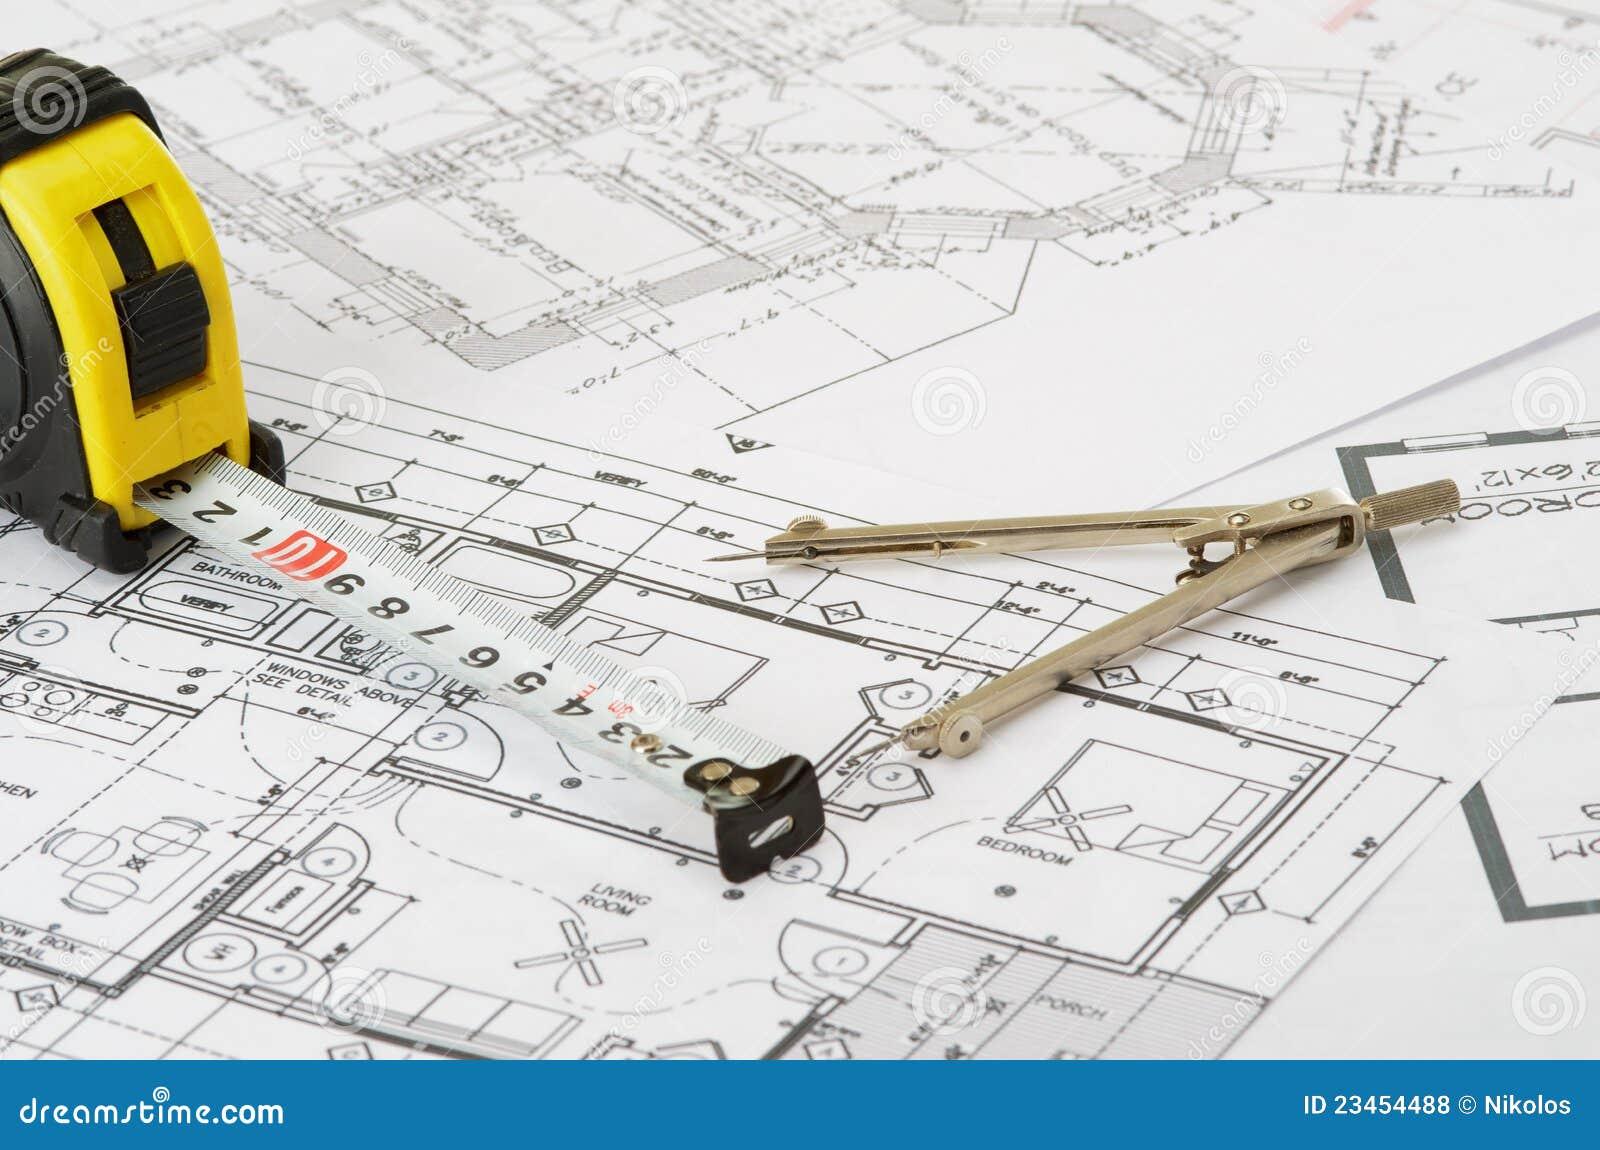 Construction drawing royalty free stock photos image for Construction drawing